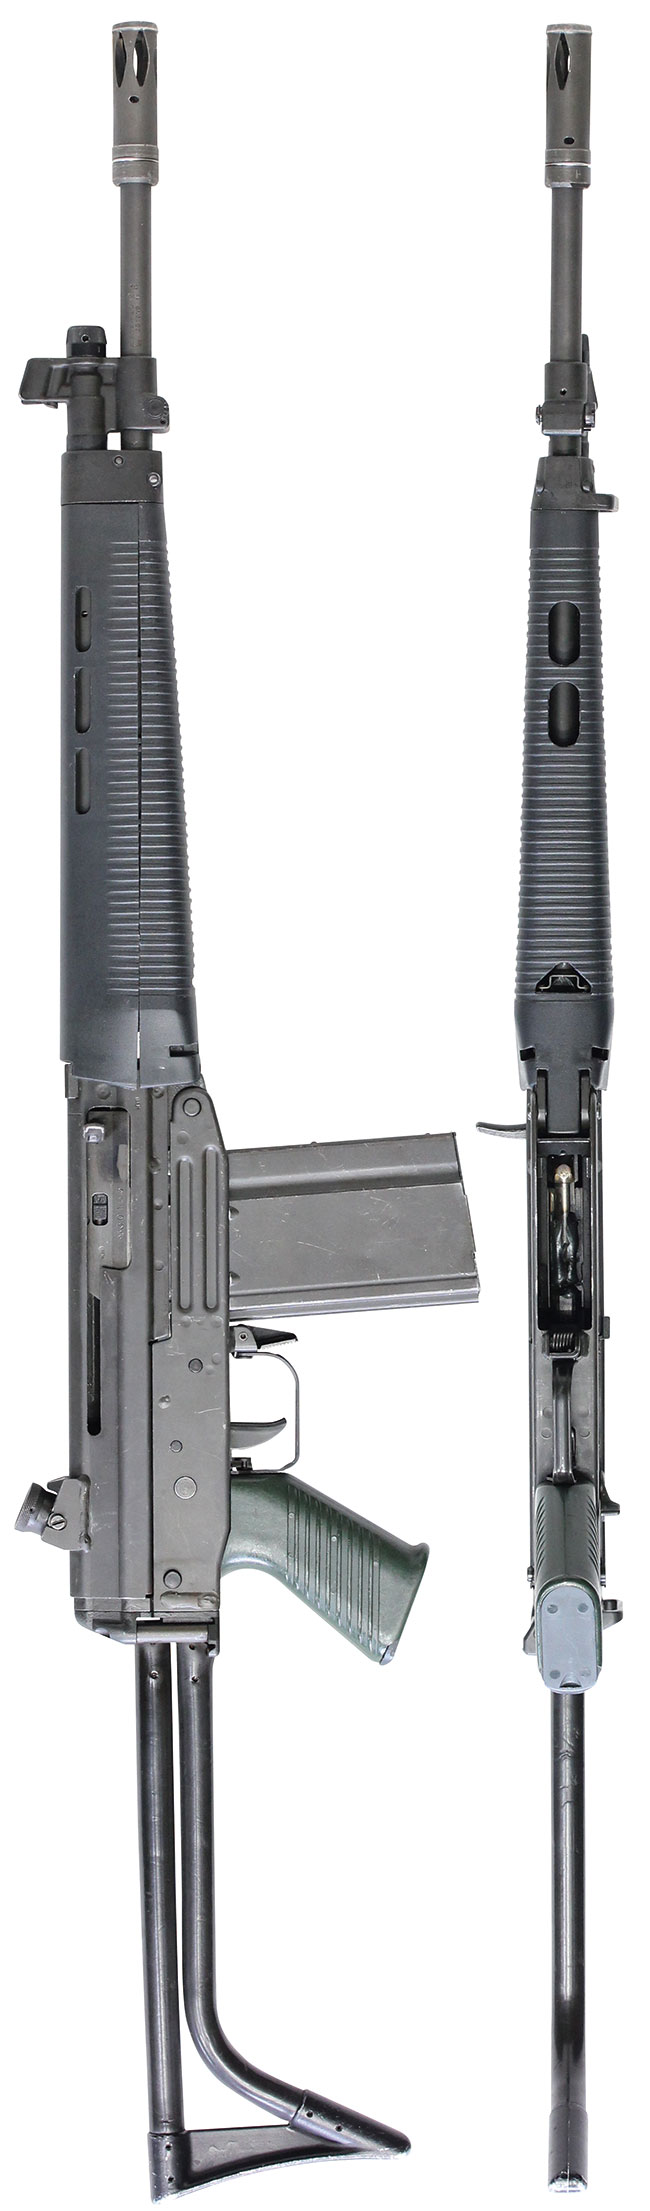 【152】SIG-SG542-空挺用自動小銃-(#30153)右.jpg